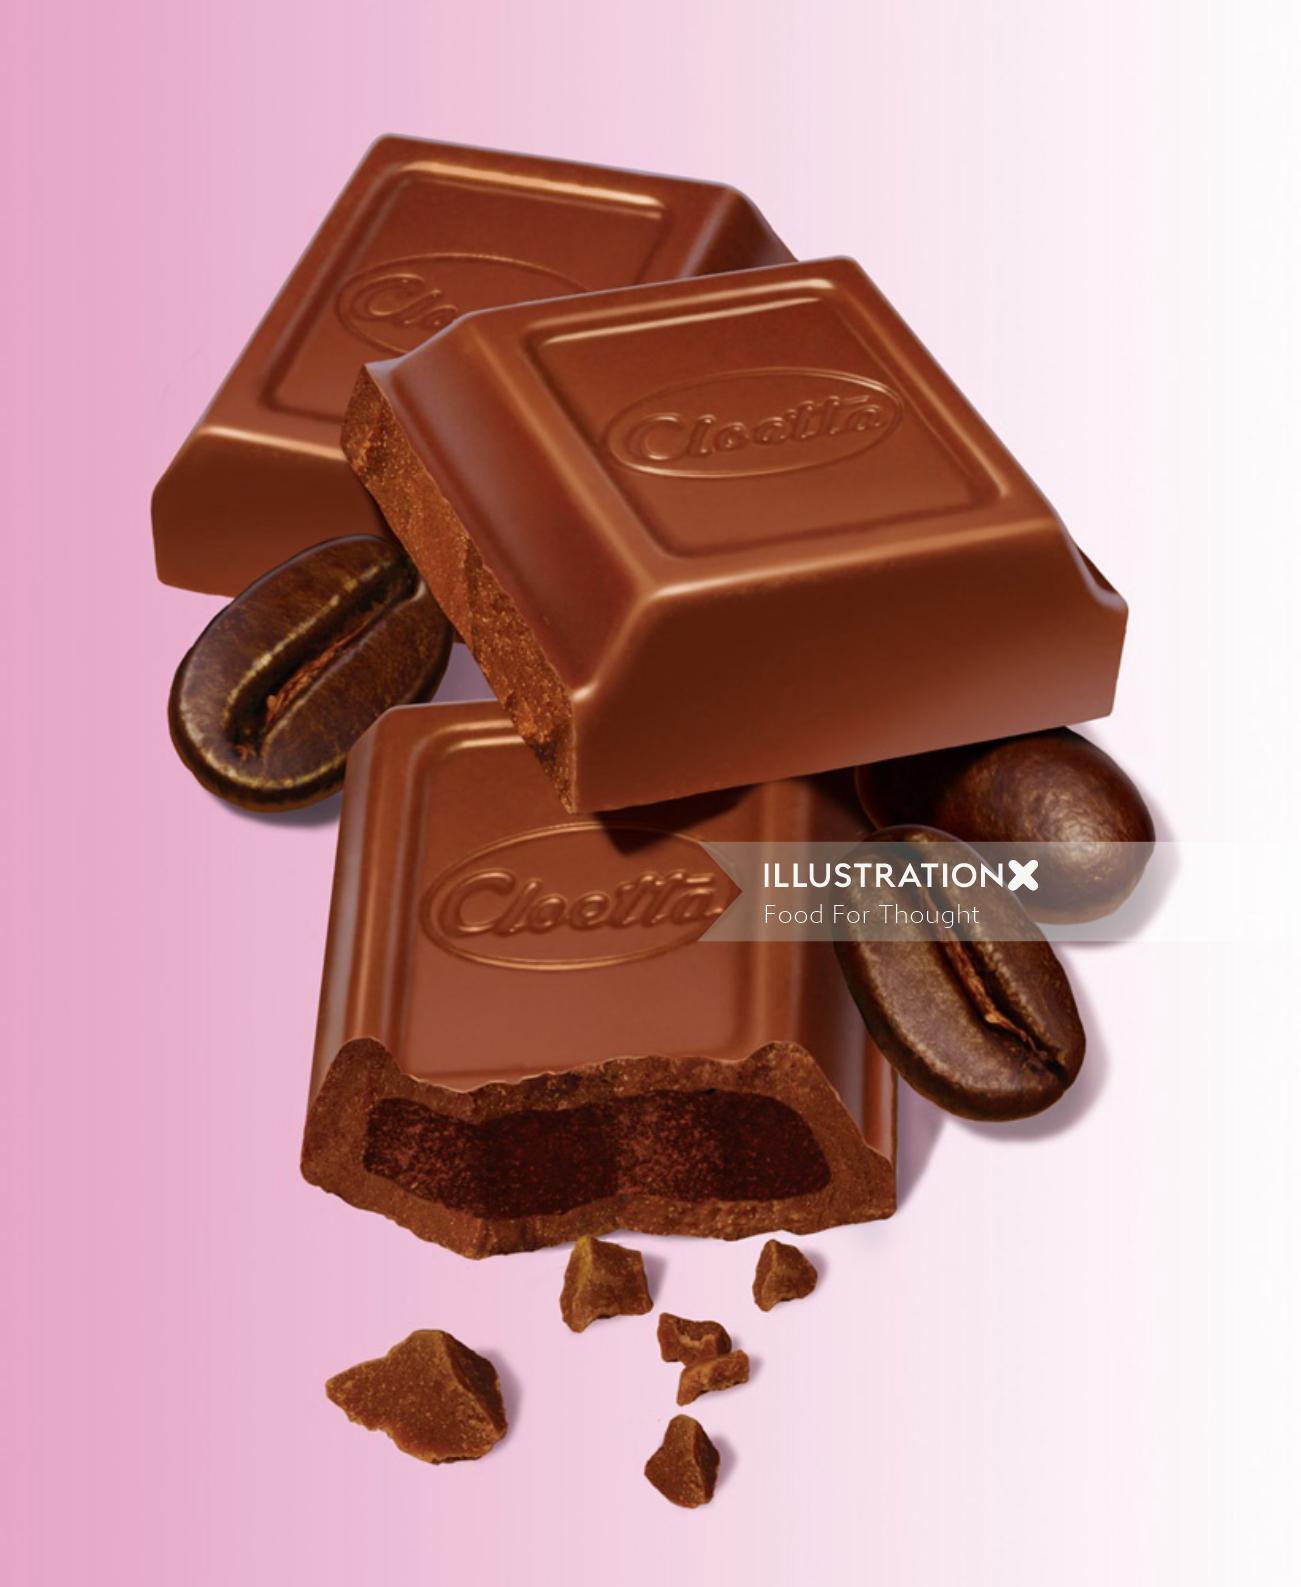 3D / CGI Rendering cloetta chocolate